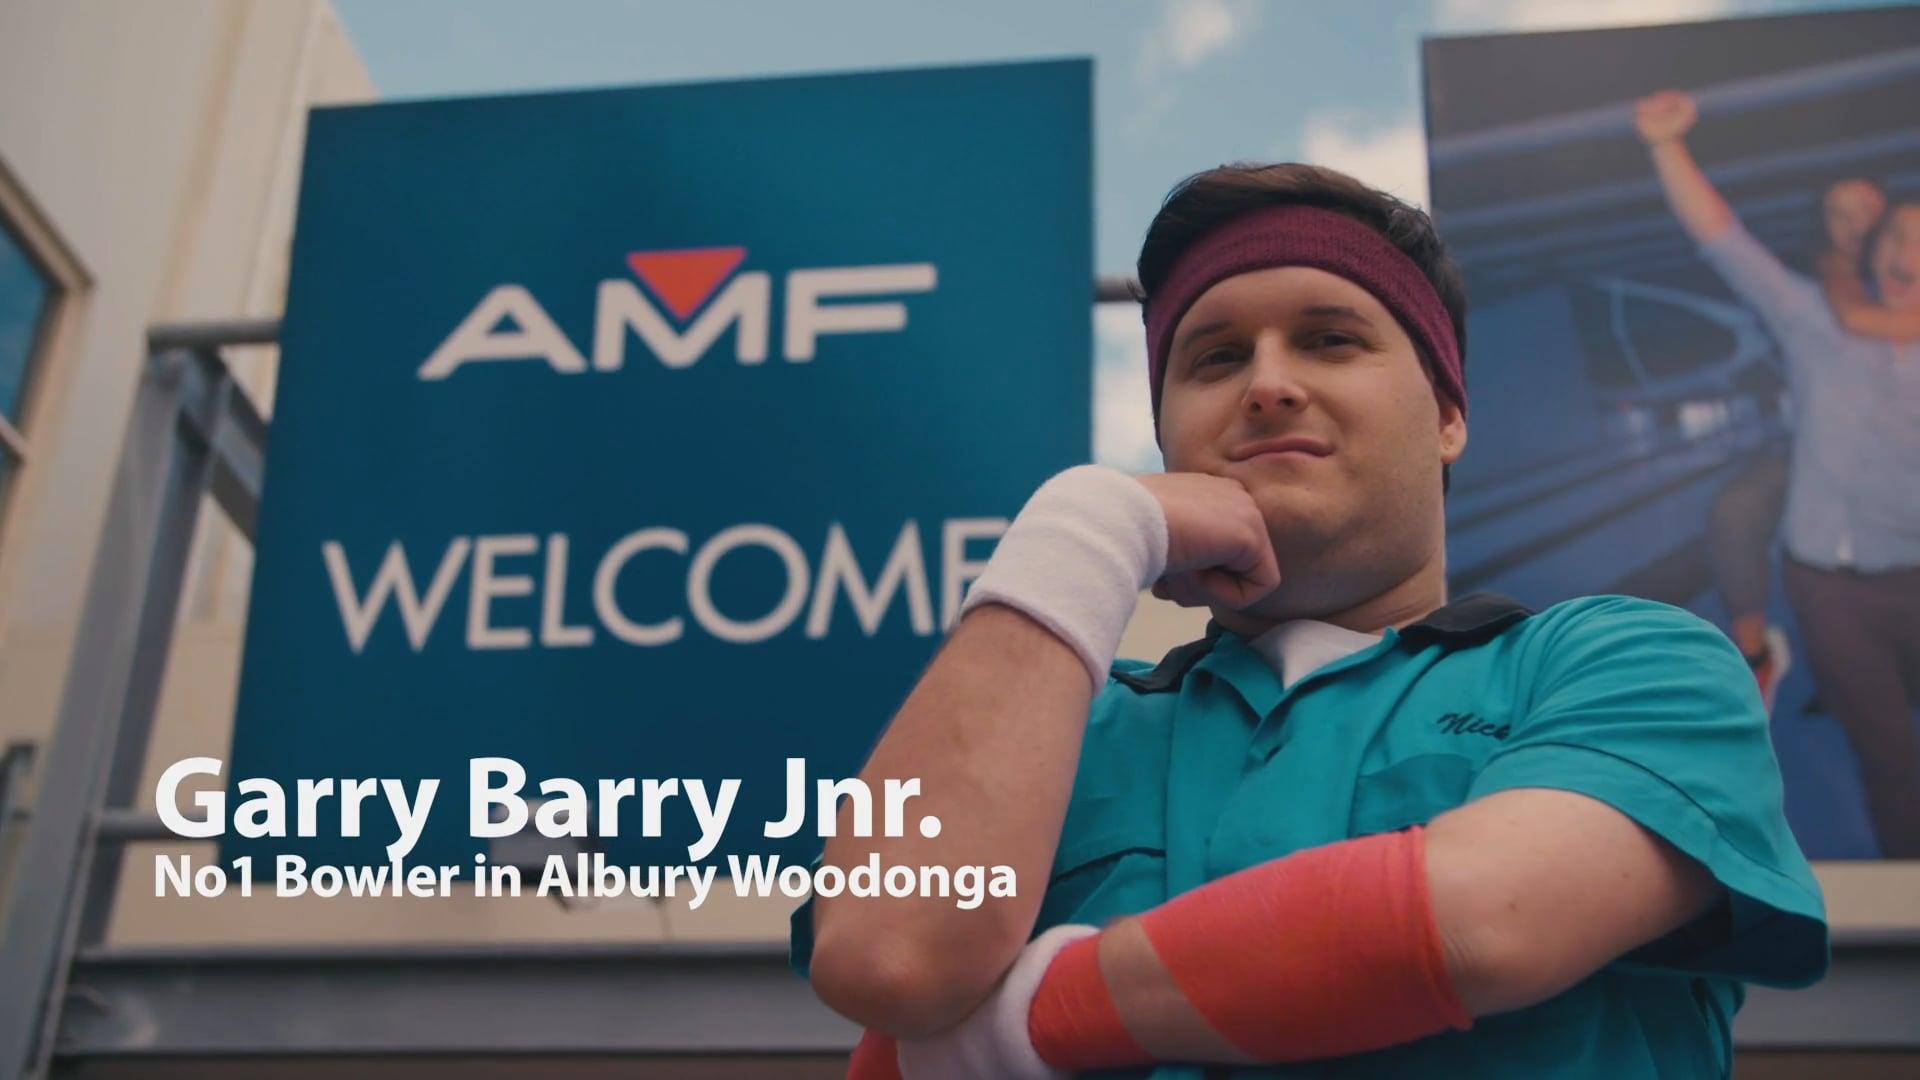 AMF // 'Australia's Biggest Bowloff'